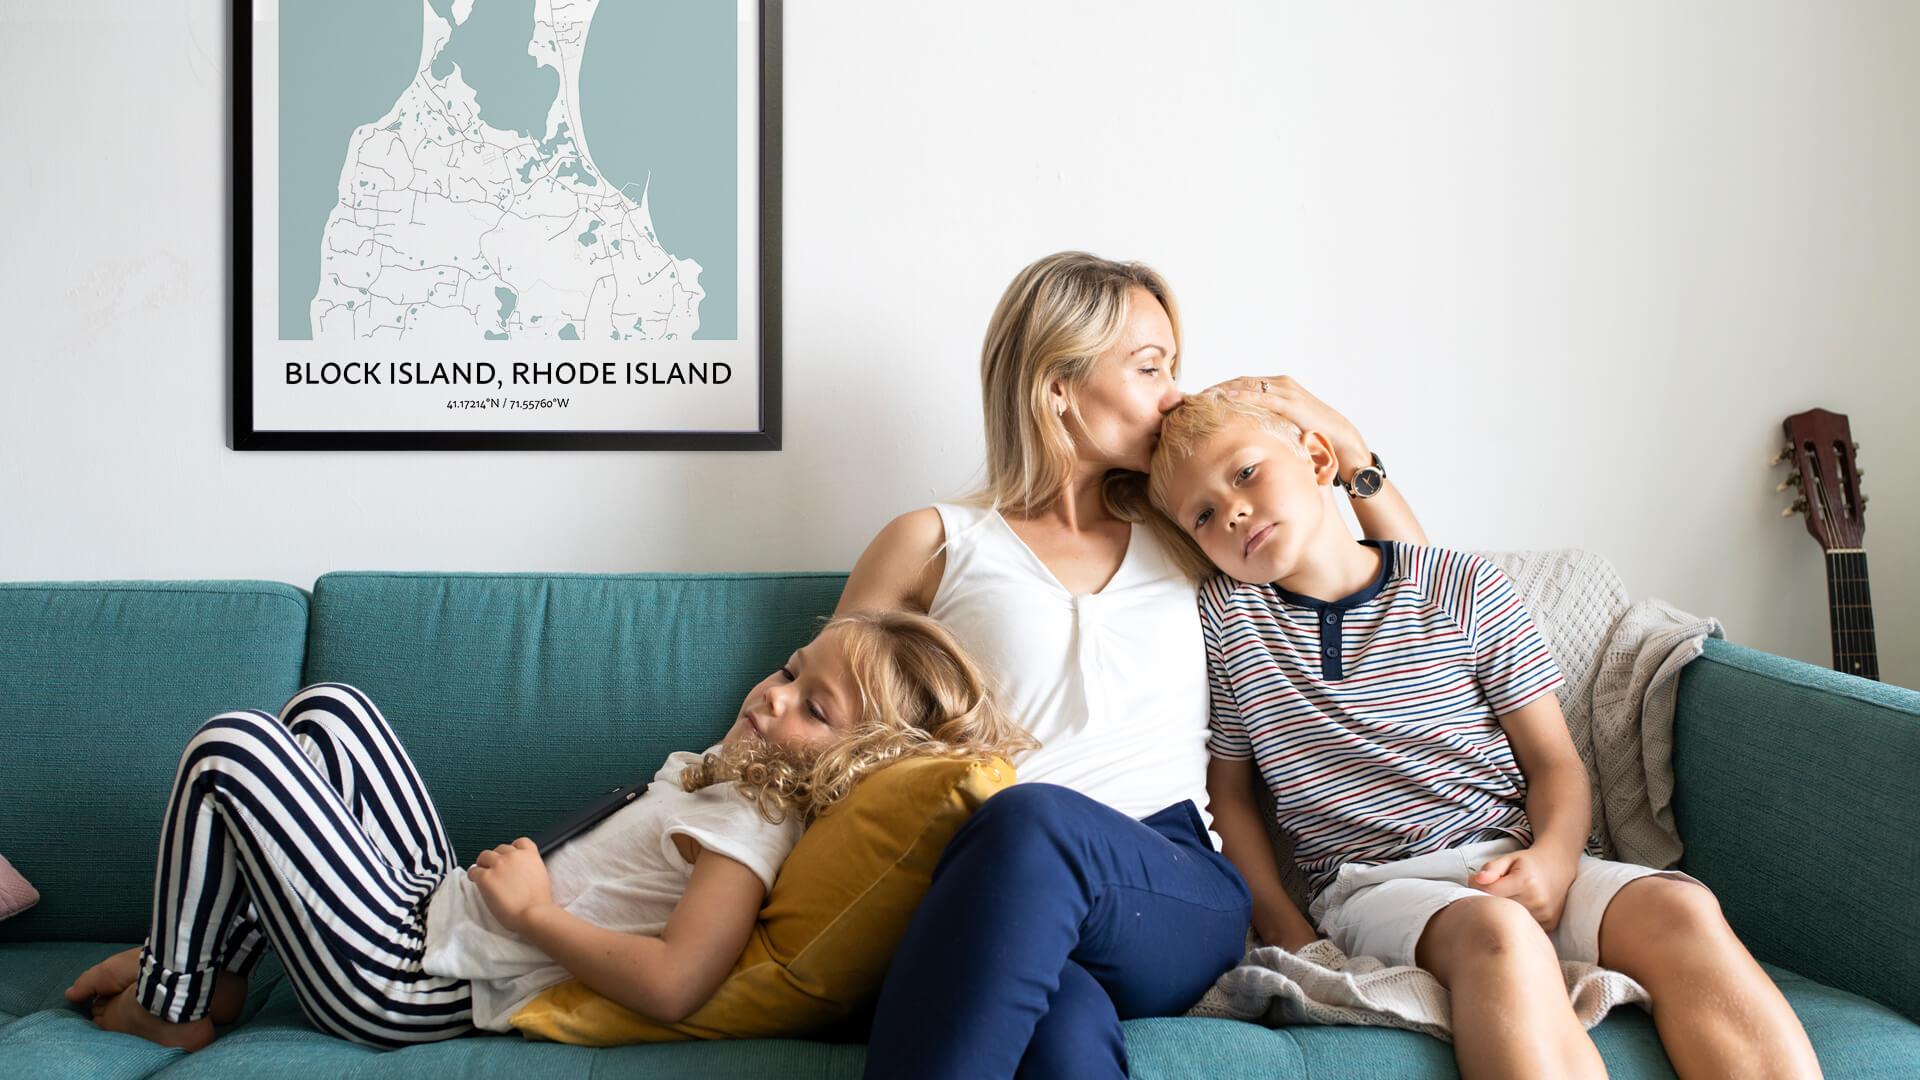 Block Island map poster